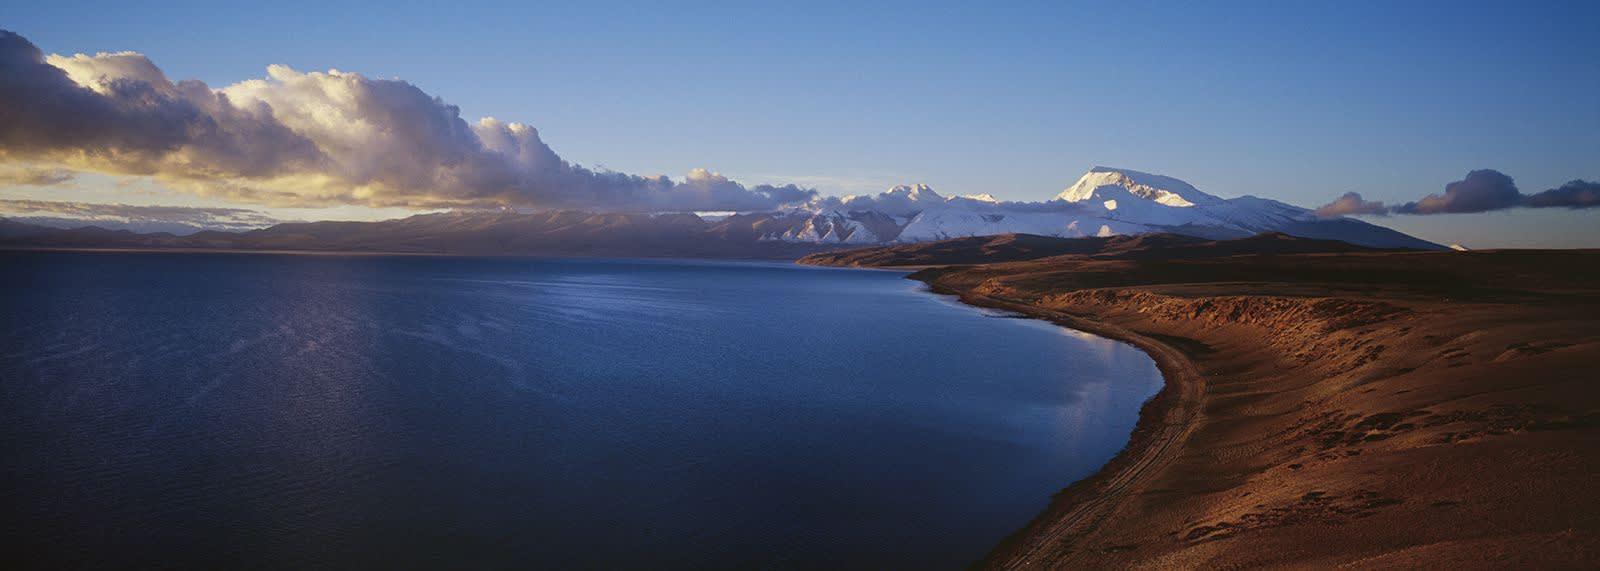 Matjaž Krivic, Lake Manasarovar and Gurla Mandhata, Tibet, 2002 – 2006